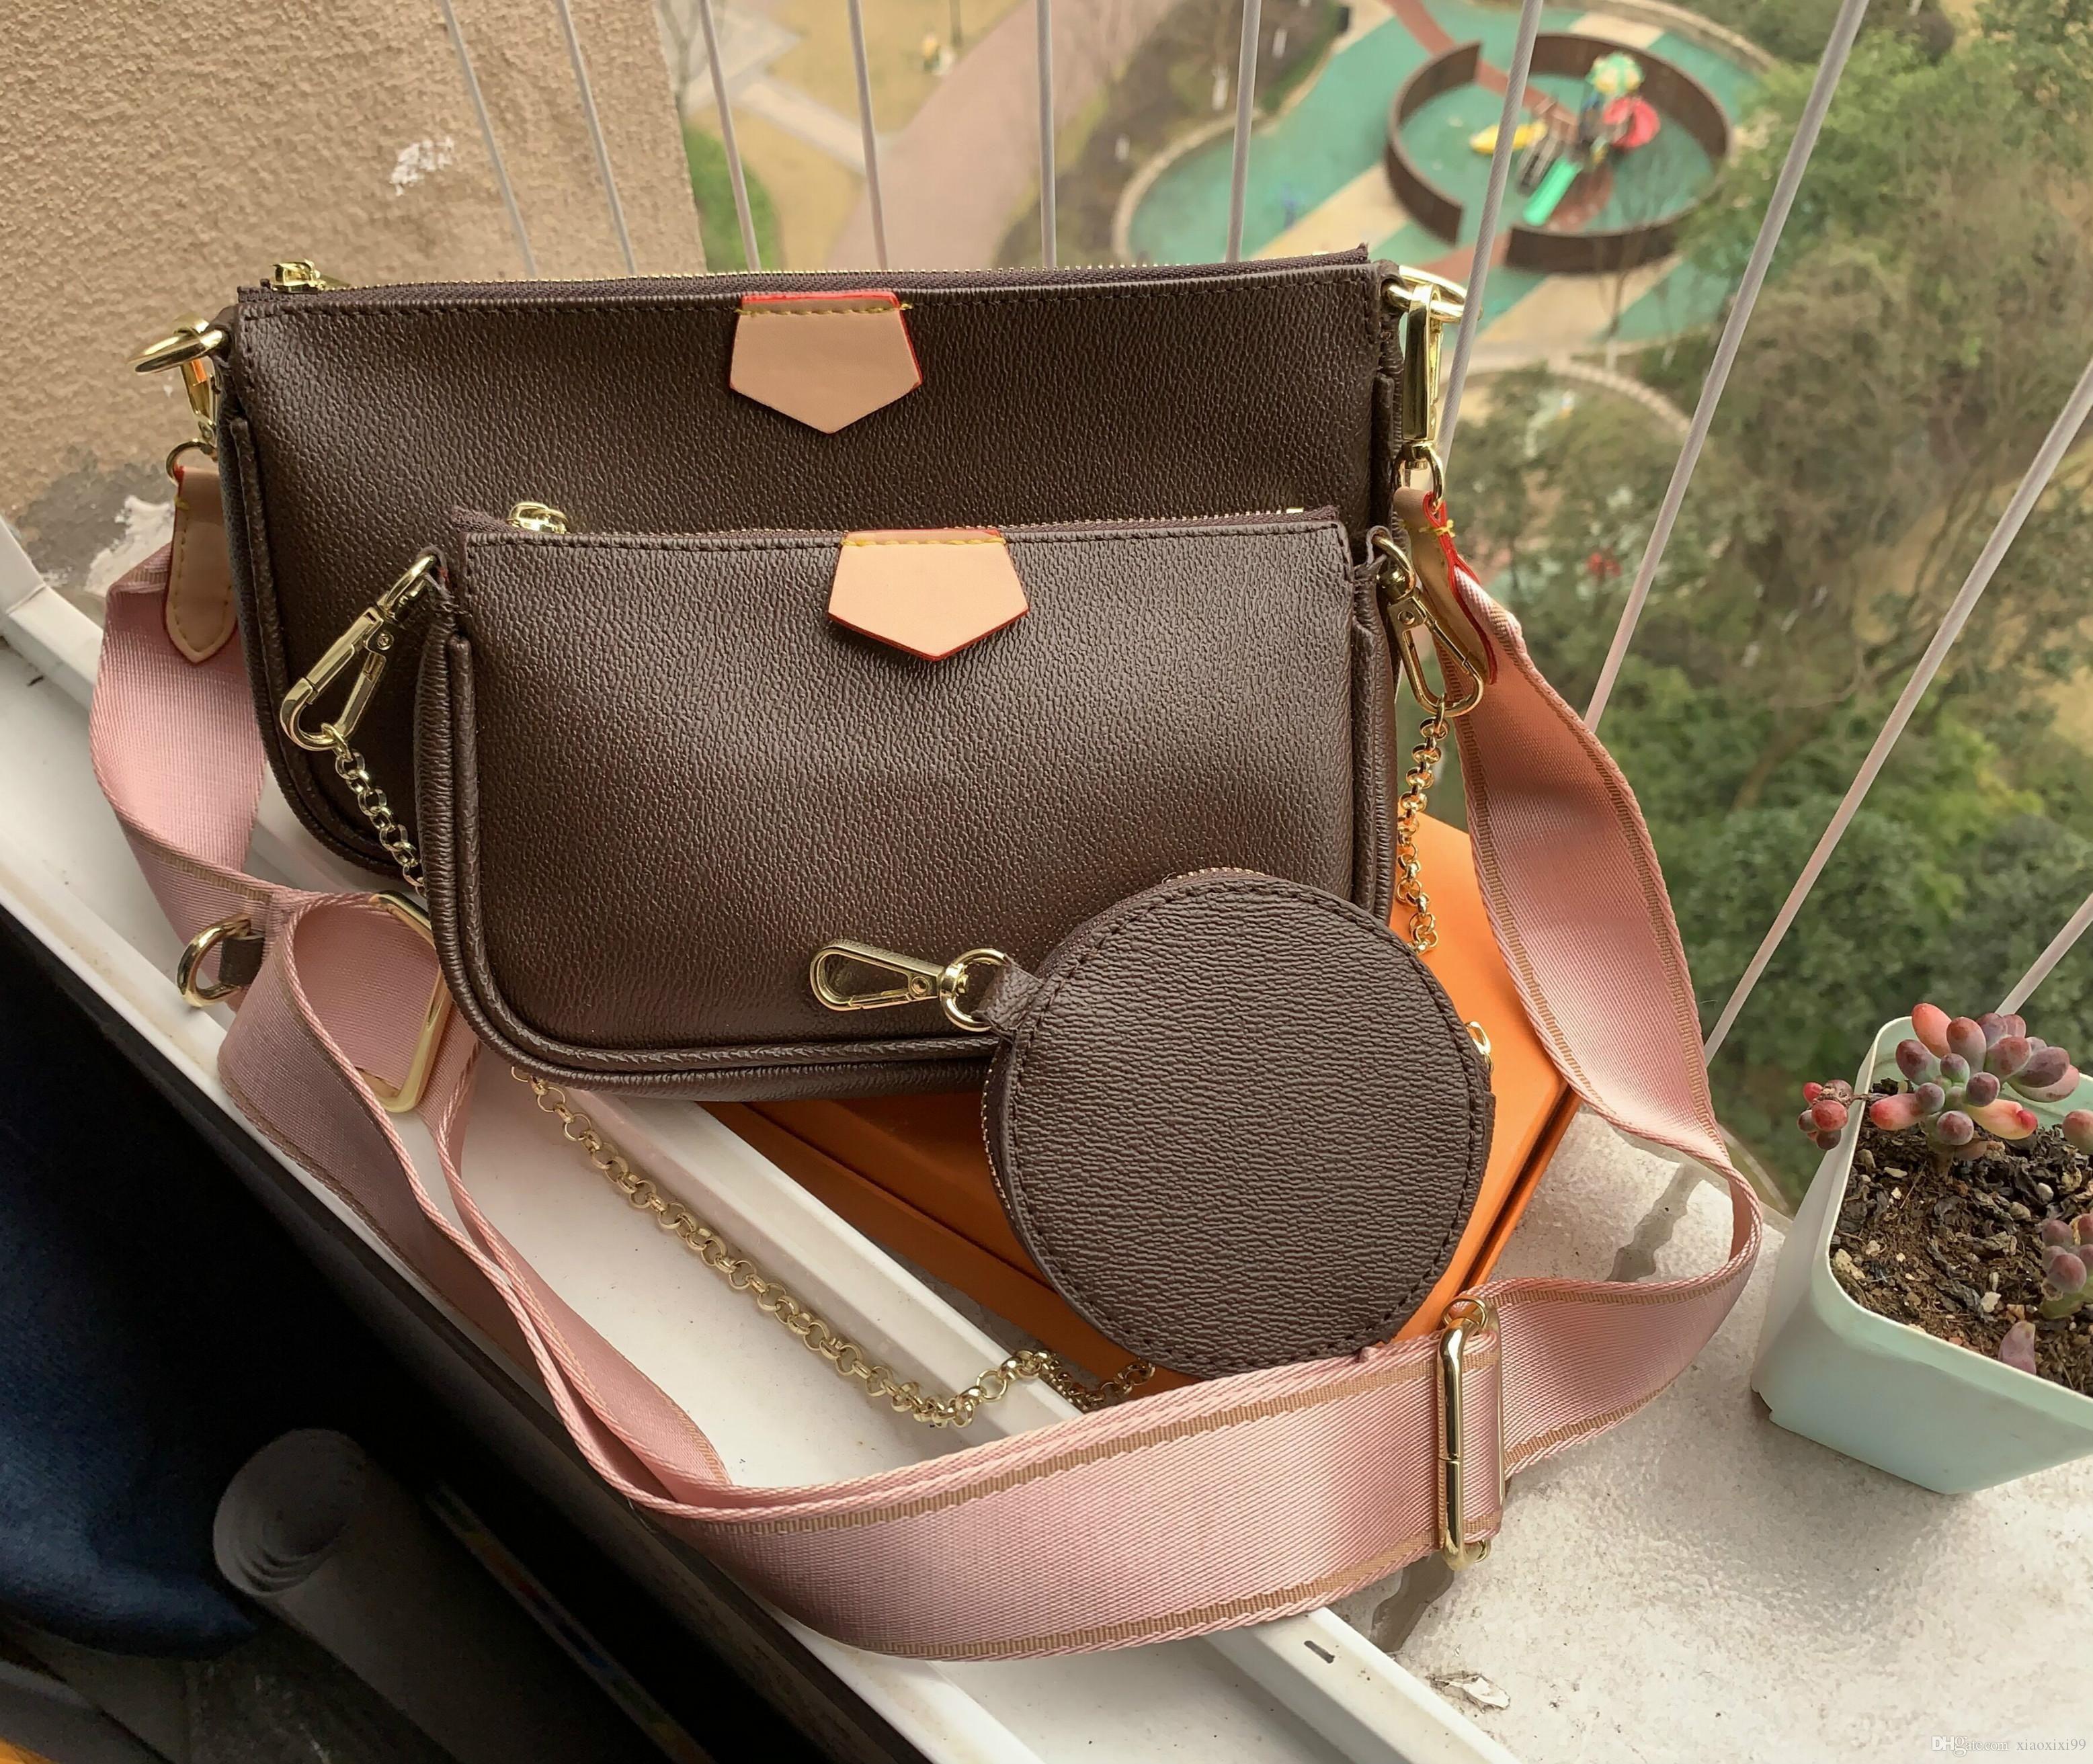 Hot Sale Fashion Vintage Handbags Women bag Designer Handbags Wallets for Women Leather Chain Bag Crossbody and Shoulder Bags